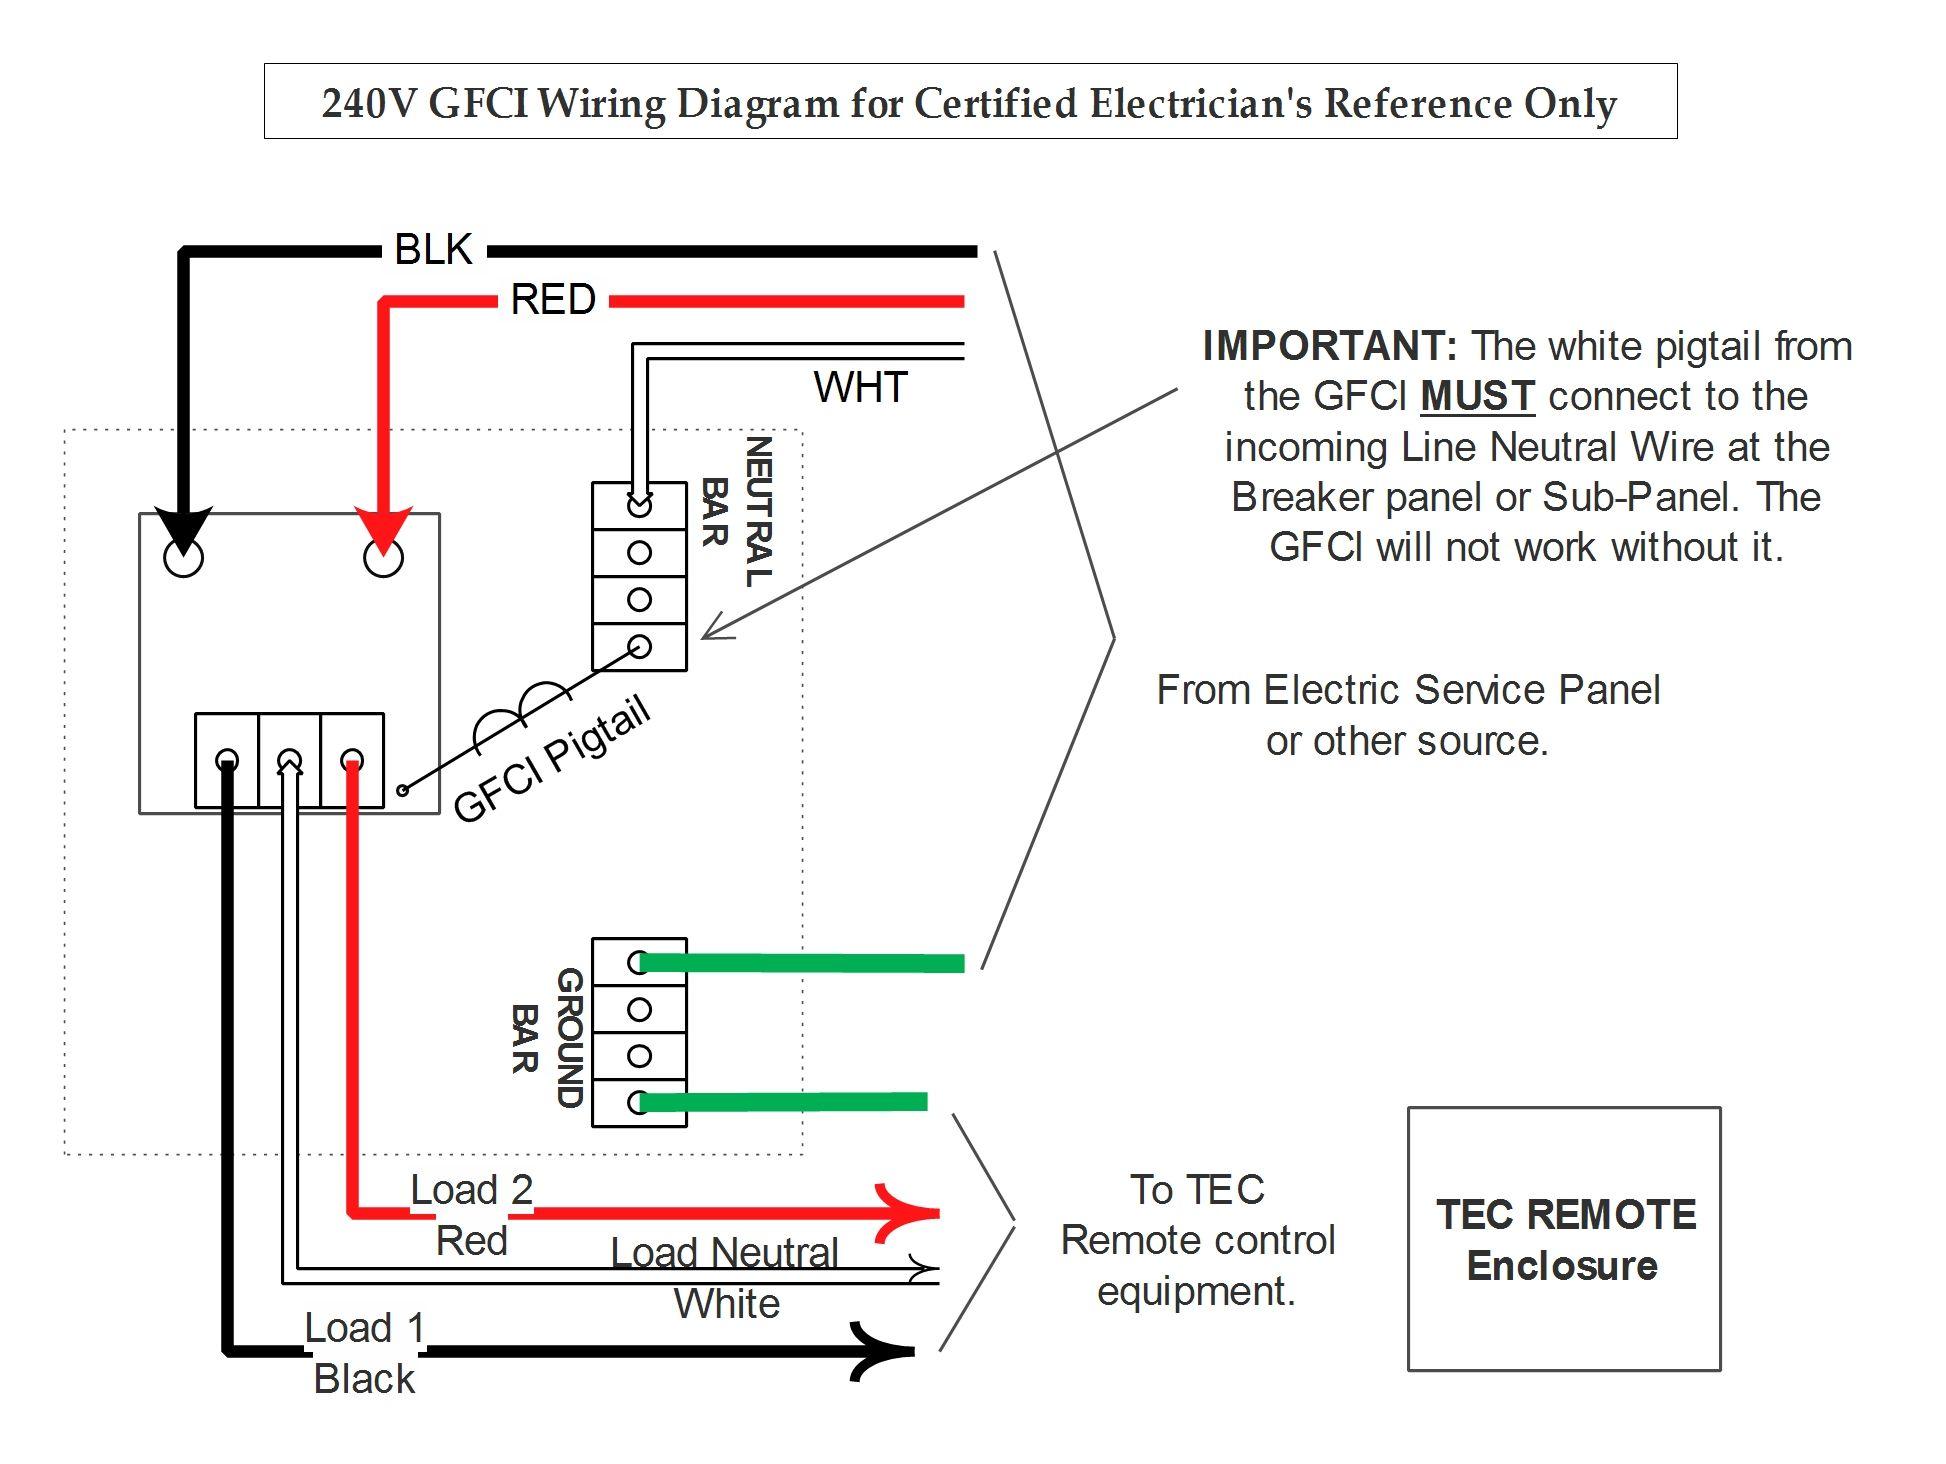 220 gfci wiring diagram sz 7470  gfi circuit wiring diagram schematic wiring  gfi circuit wiring diagram schematic wiring